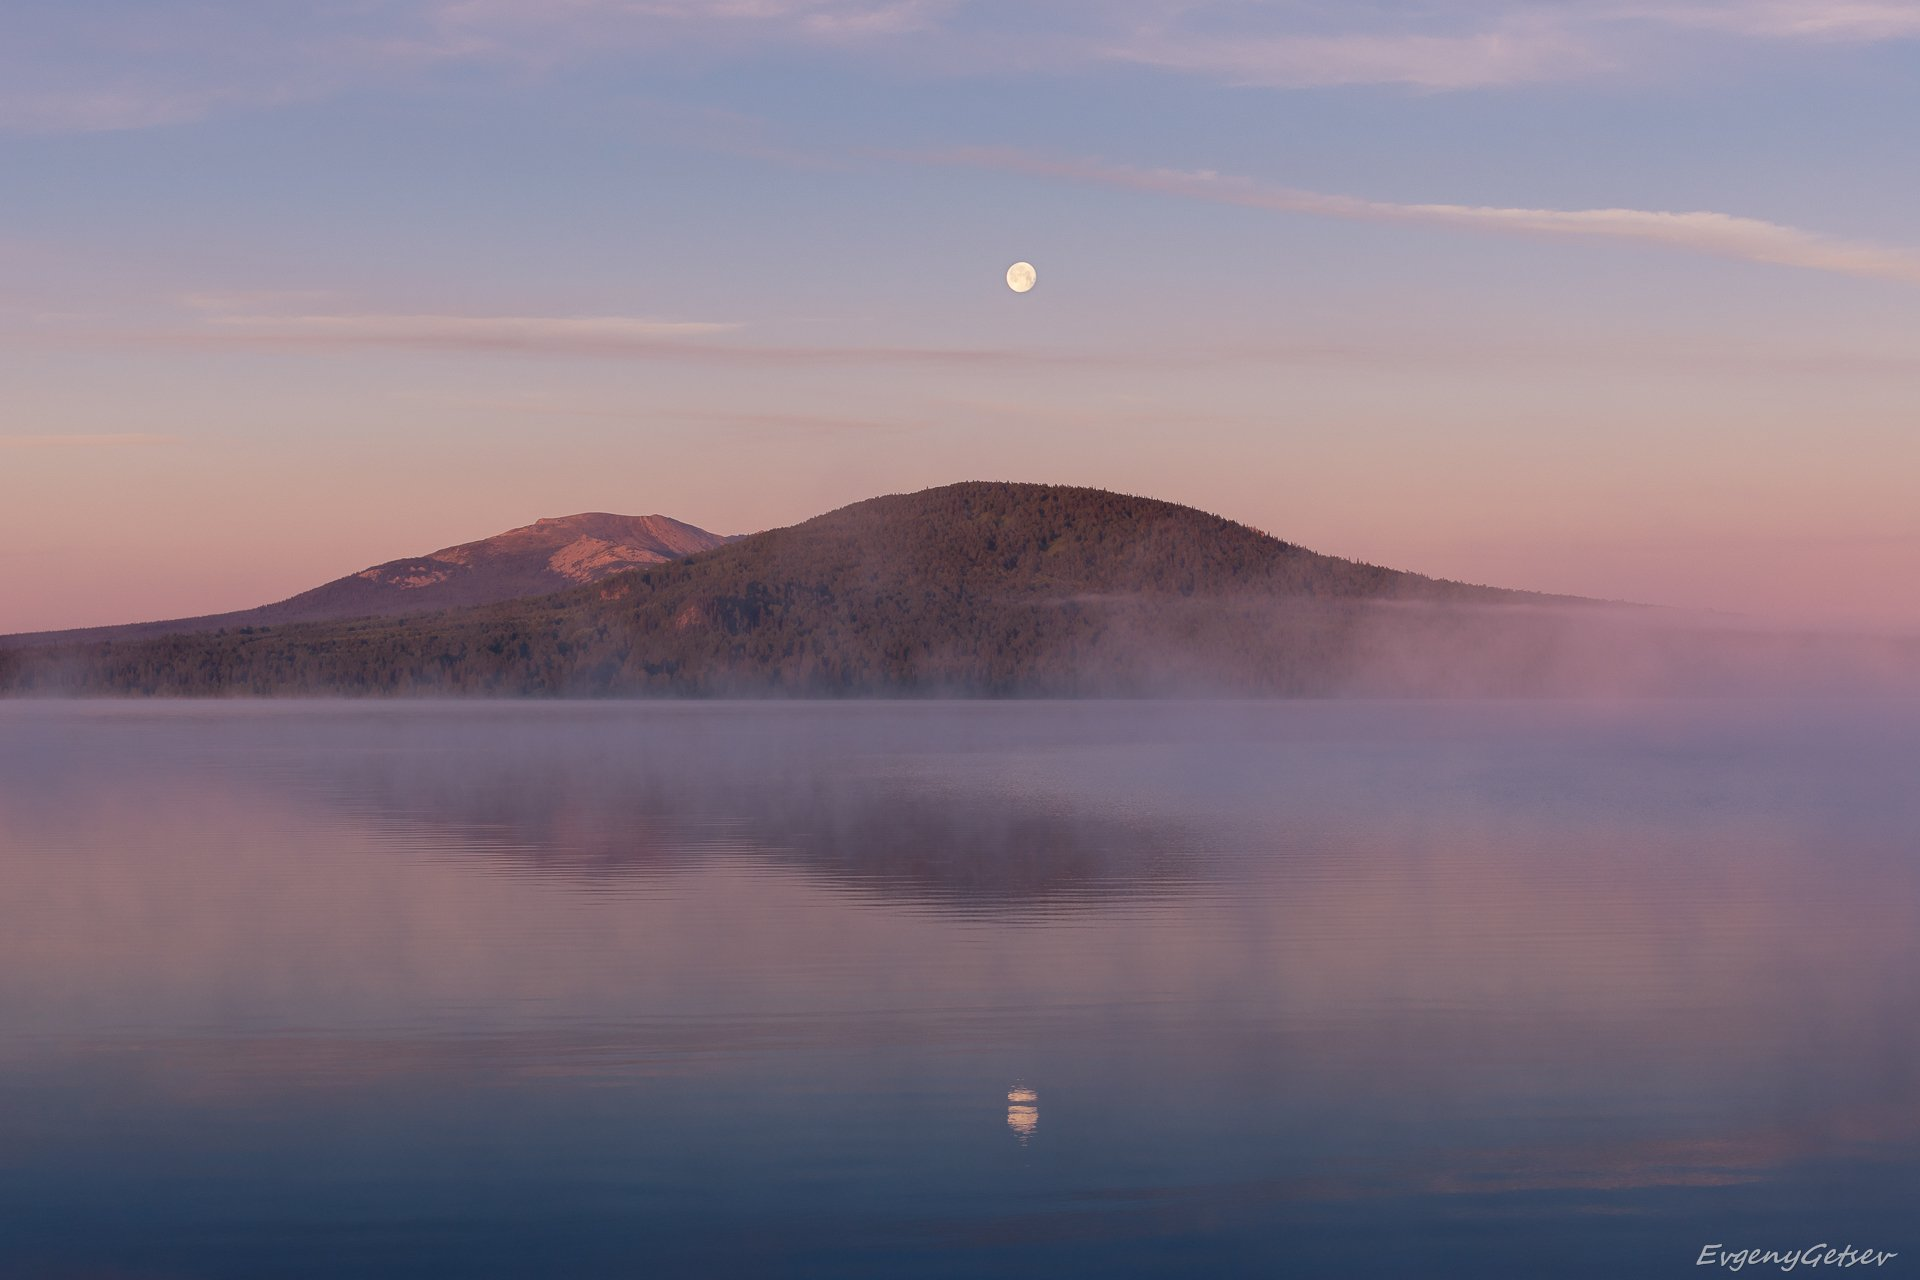 пейзаж, зюраткуль, урал, рассвет, луна, туман, Евгений Гецев